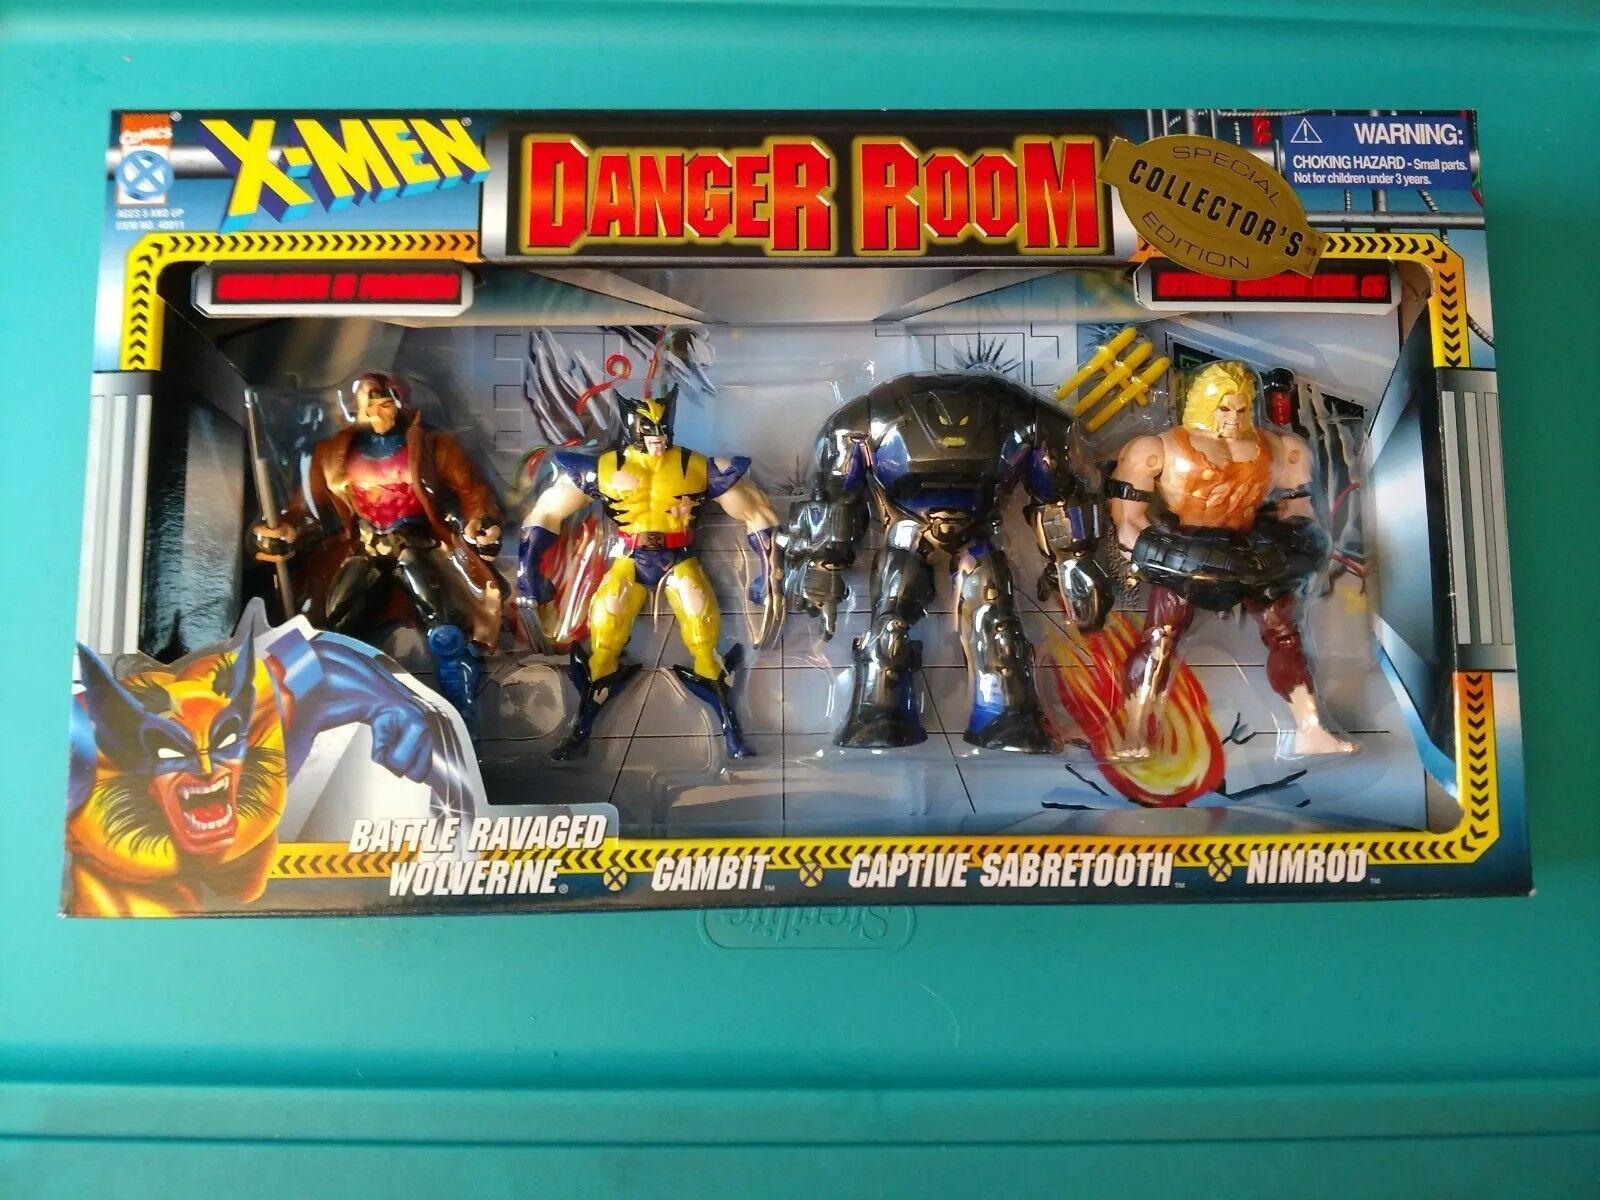 1996 X-Men Danger Room collector's special edition by toybiz.